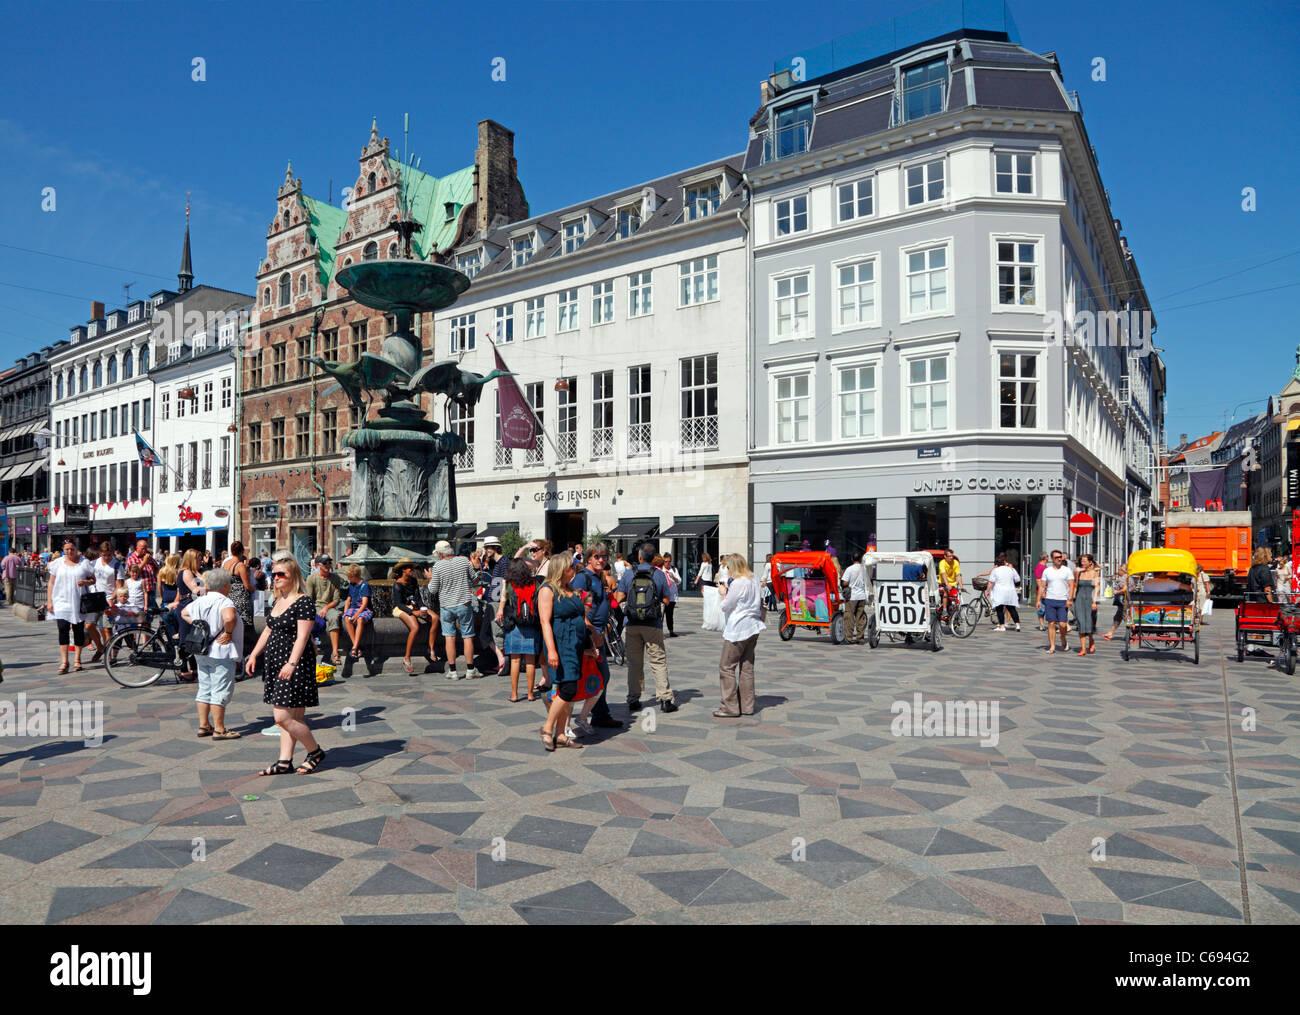 The Stork Fountain on the pedestrian street Strøget in Copenhagen. The shops of Georg Jensen and Royal Copenhagen - Stock Image